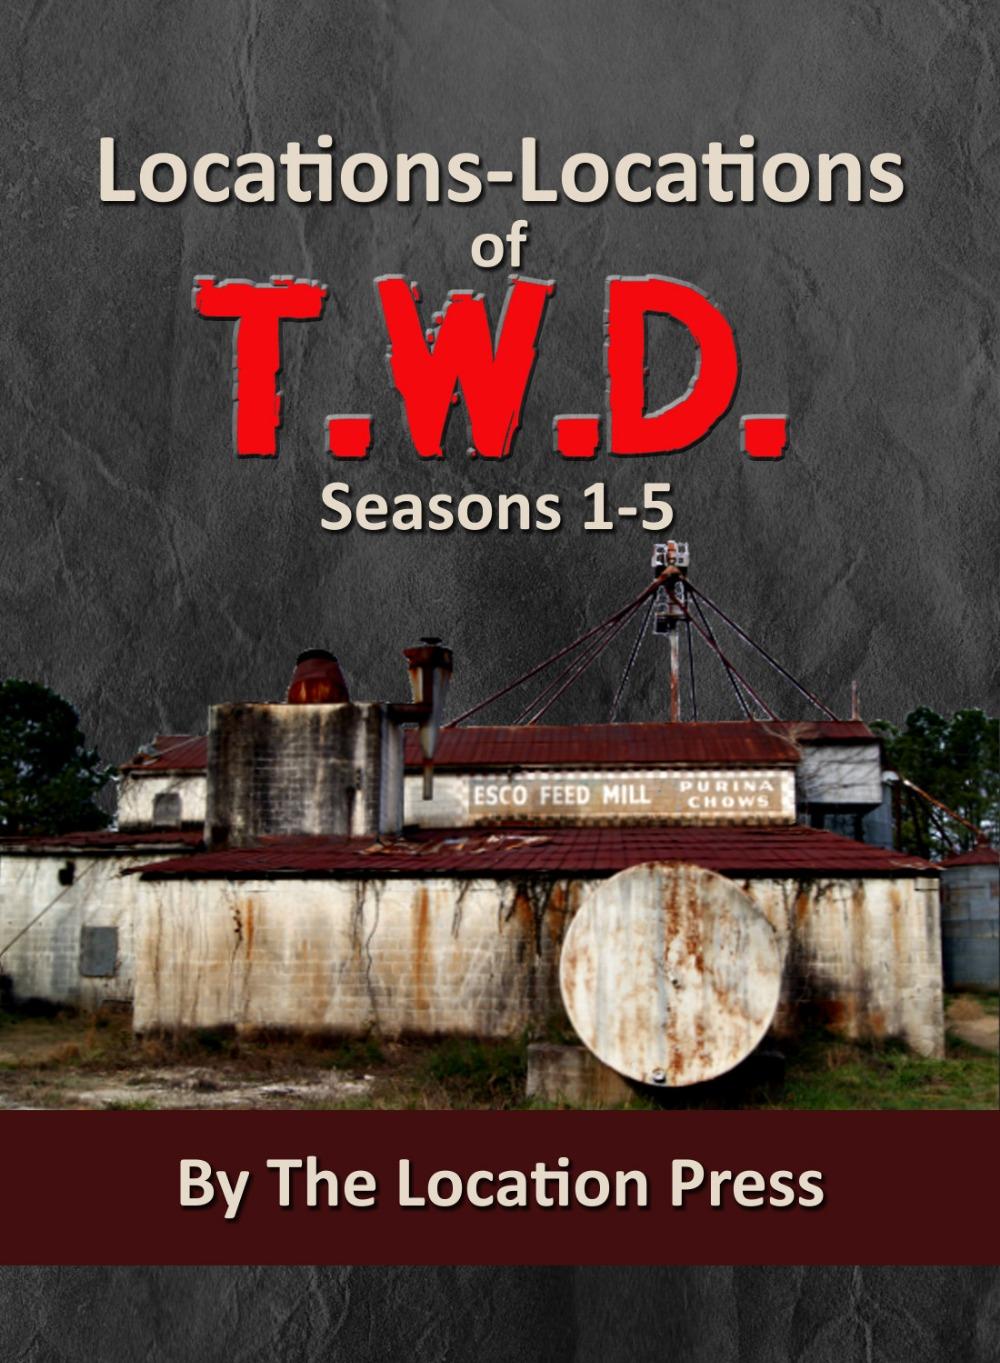 Locations-Locations of T.W.D. Seasons 1-5